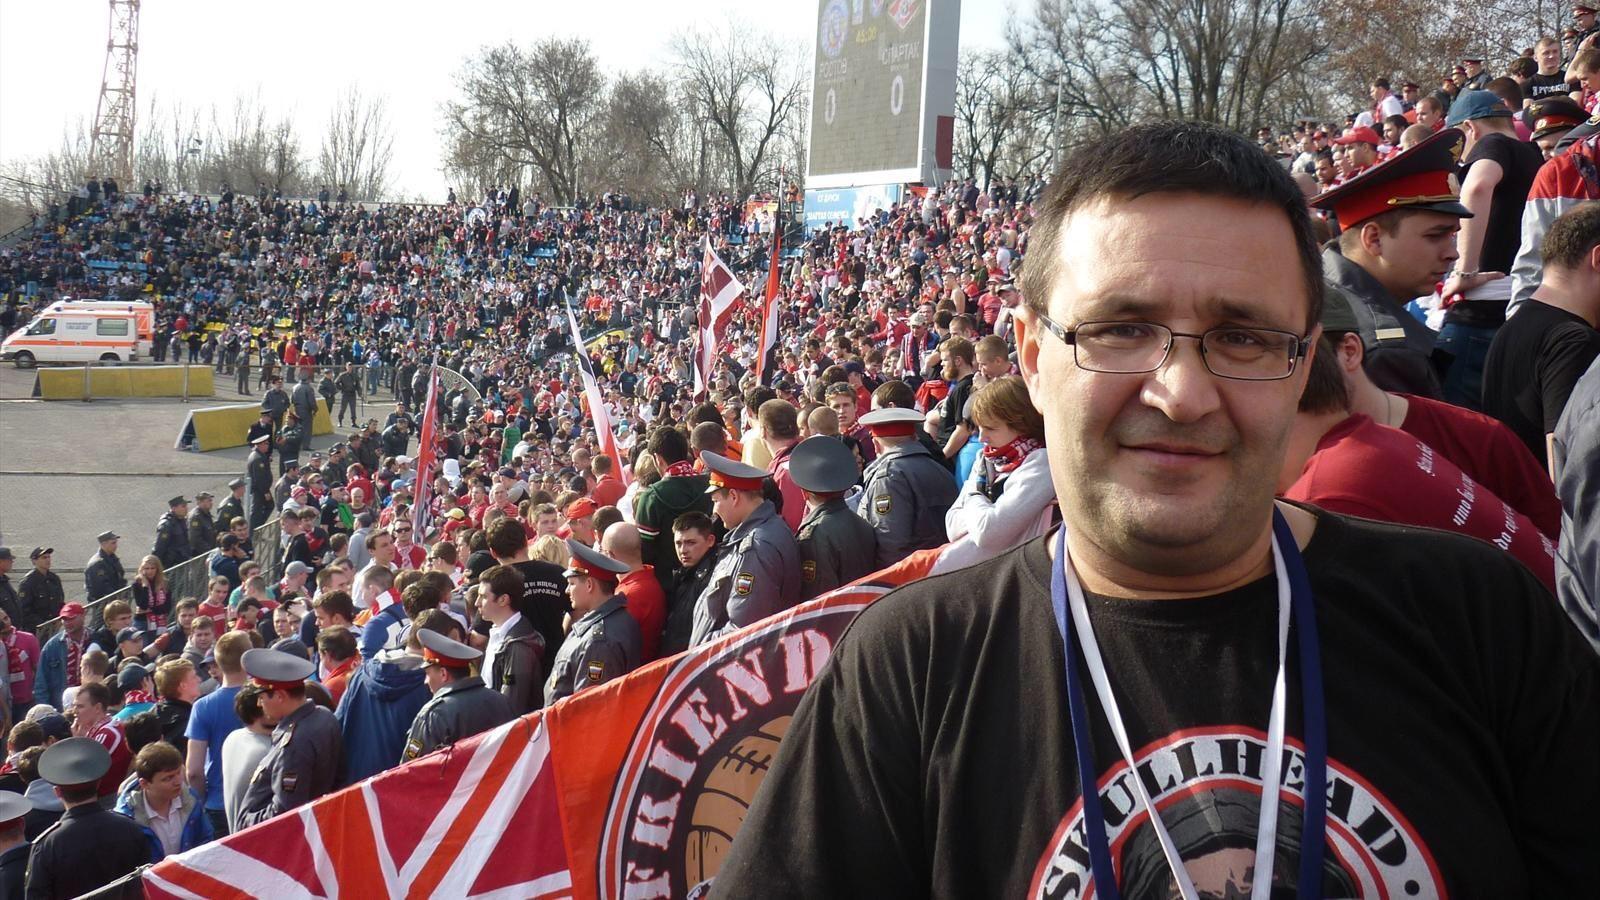 Амир Хуслютдинов: Панов на трибуне «Спартака»? Флаг ему в руки